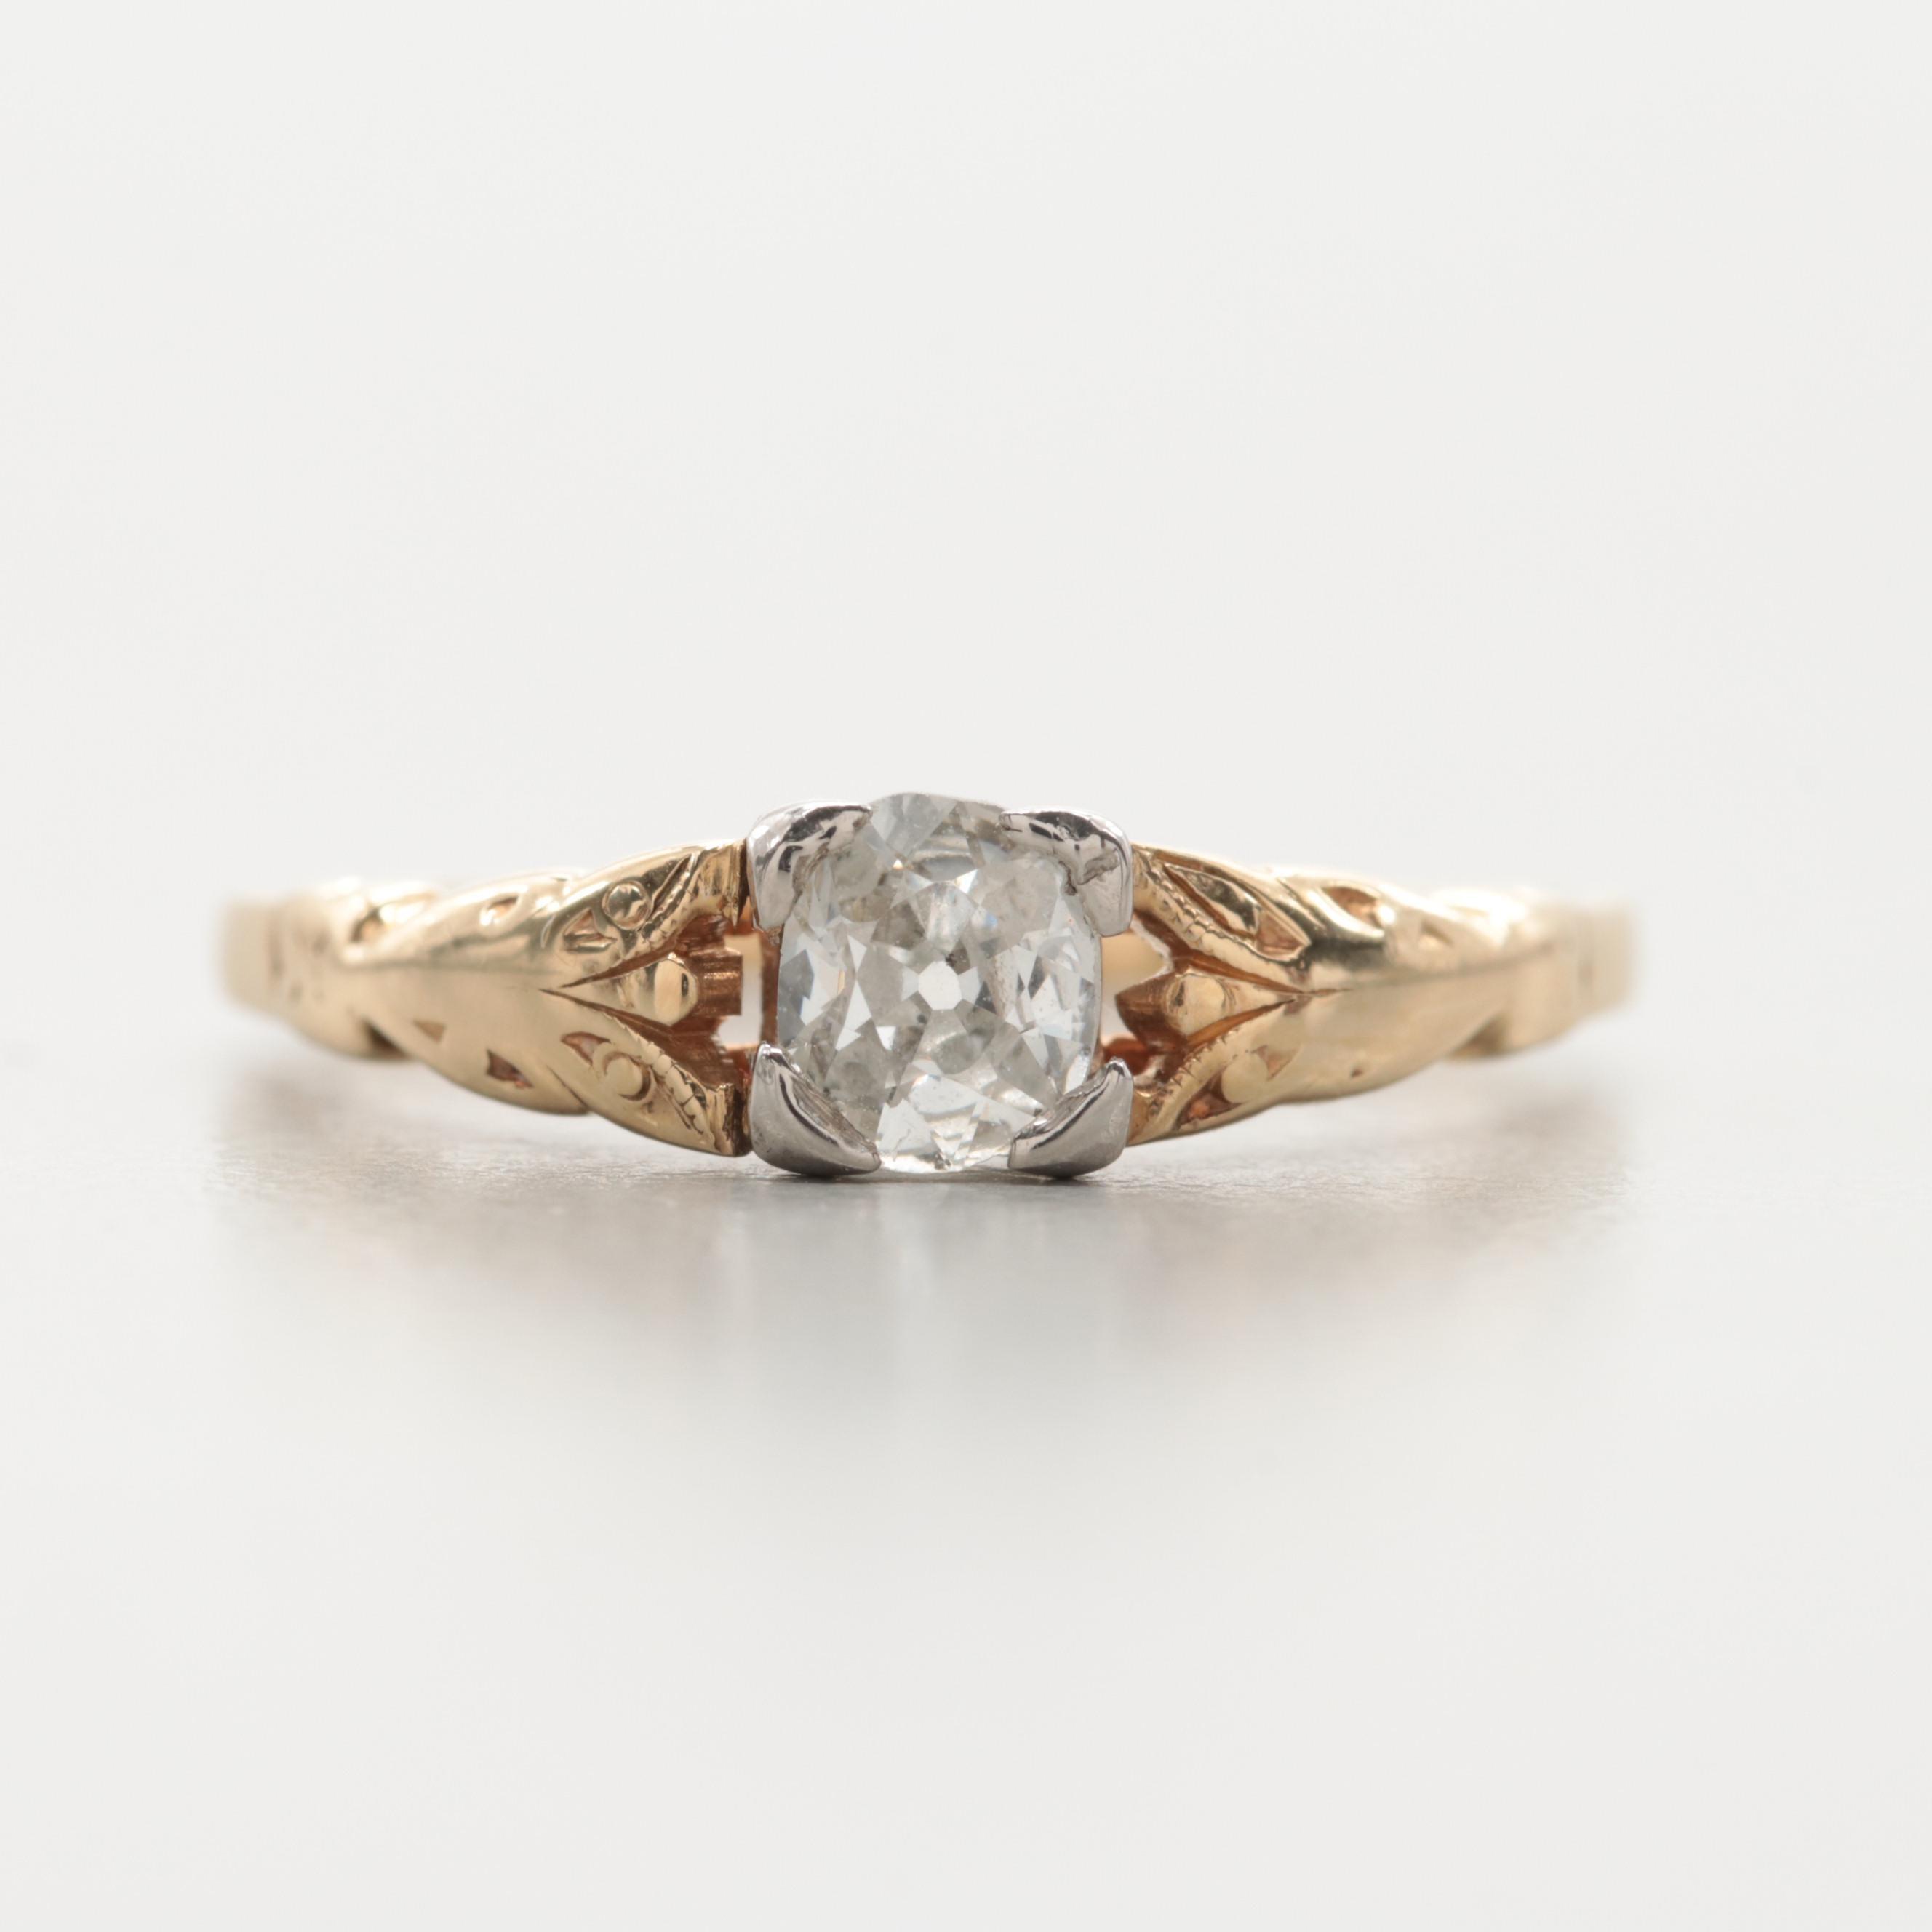 Retro Era 14K Yellow Gold Diamond Ring with Palladium Accent